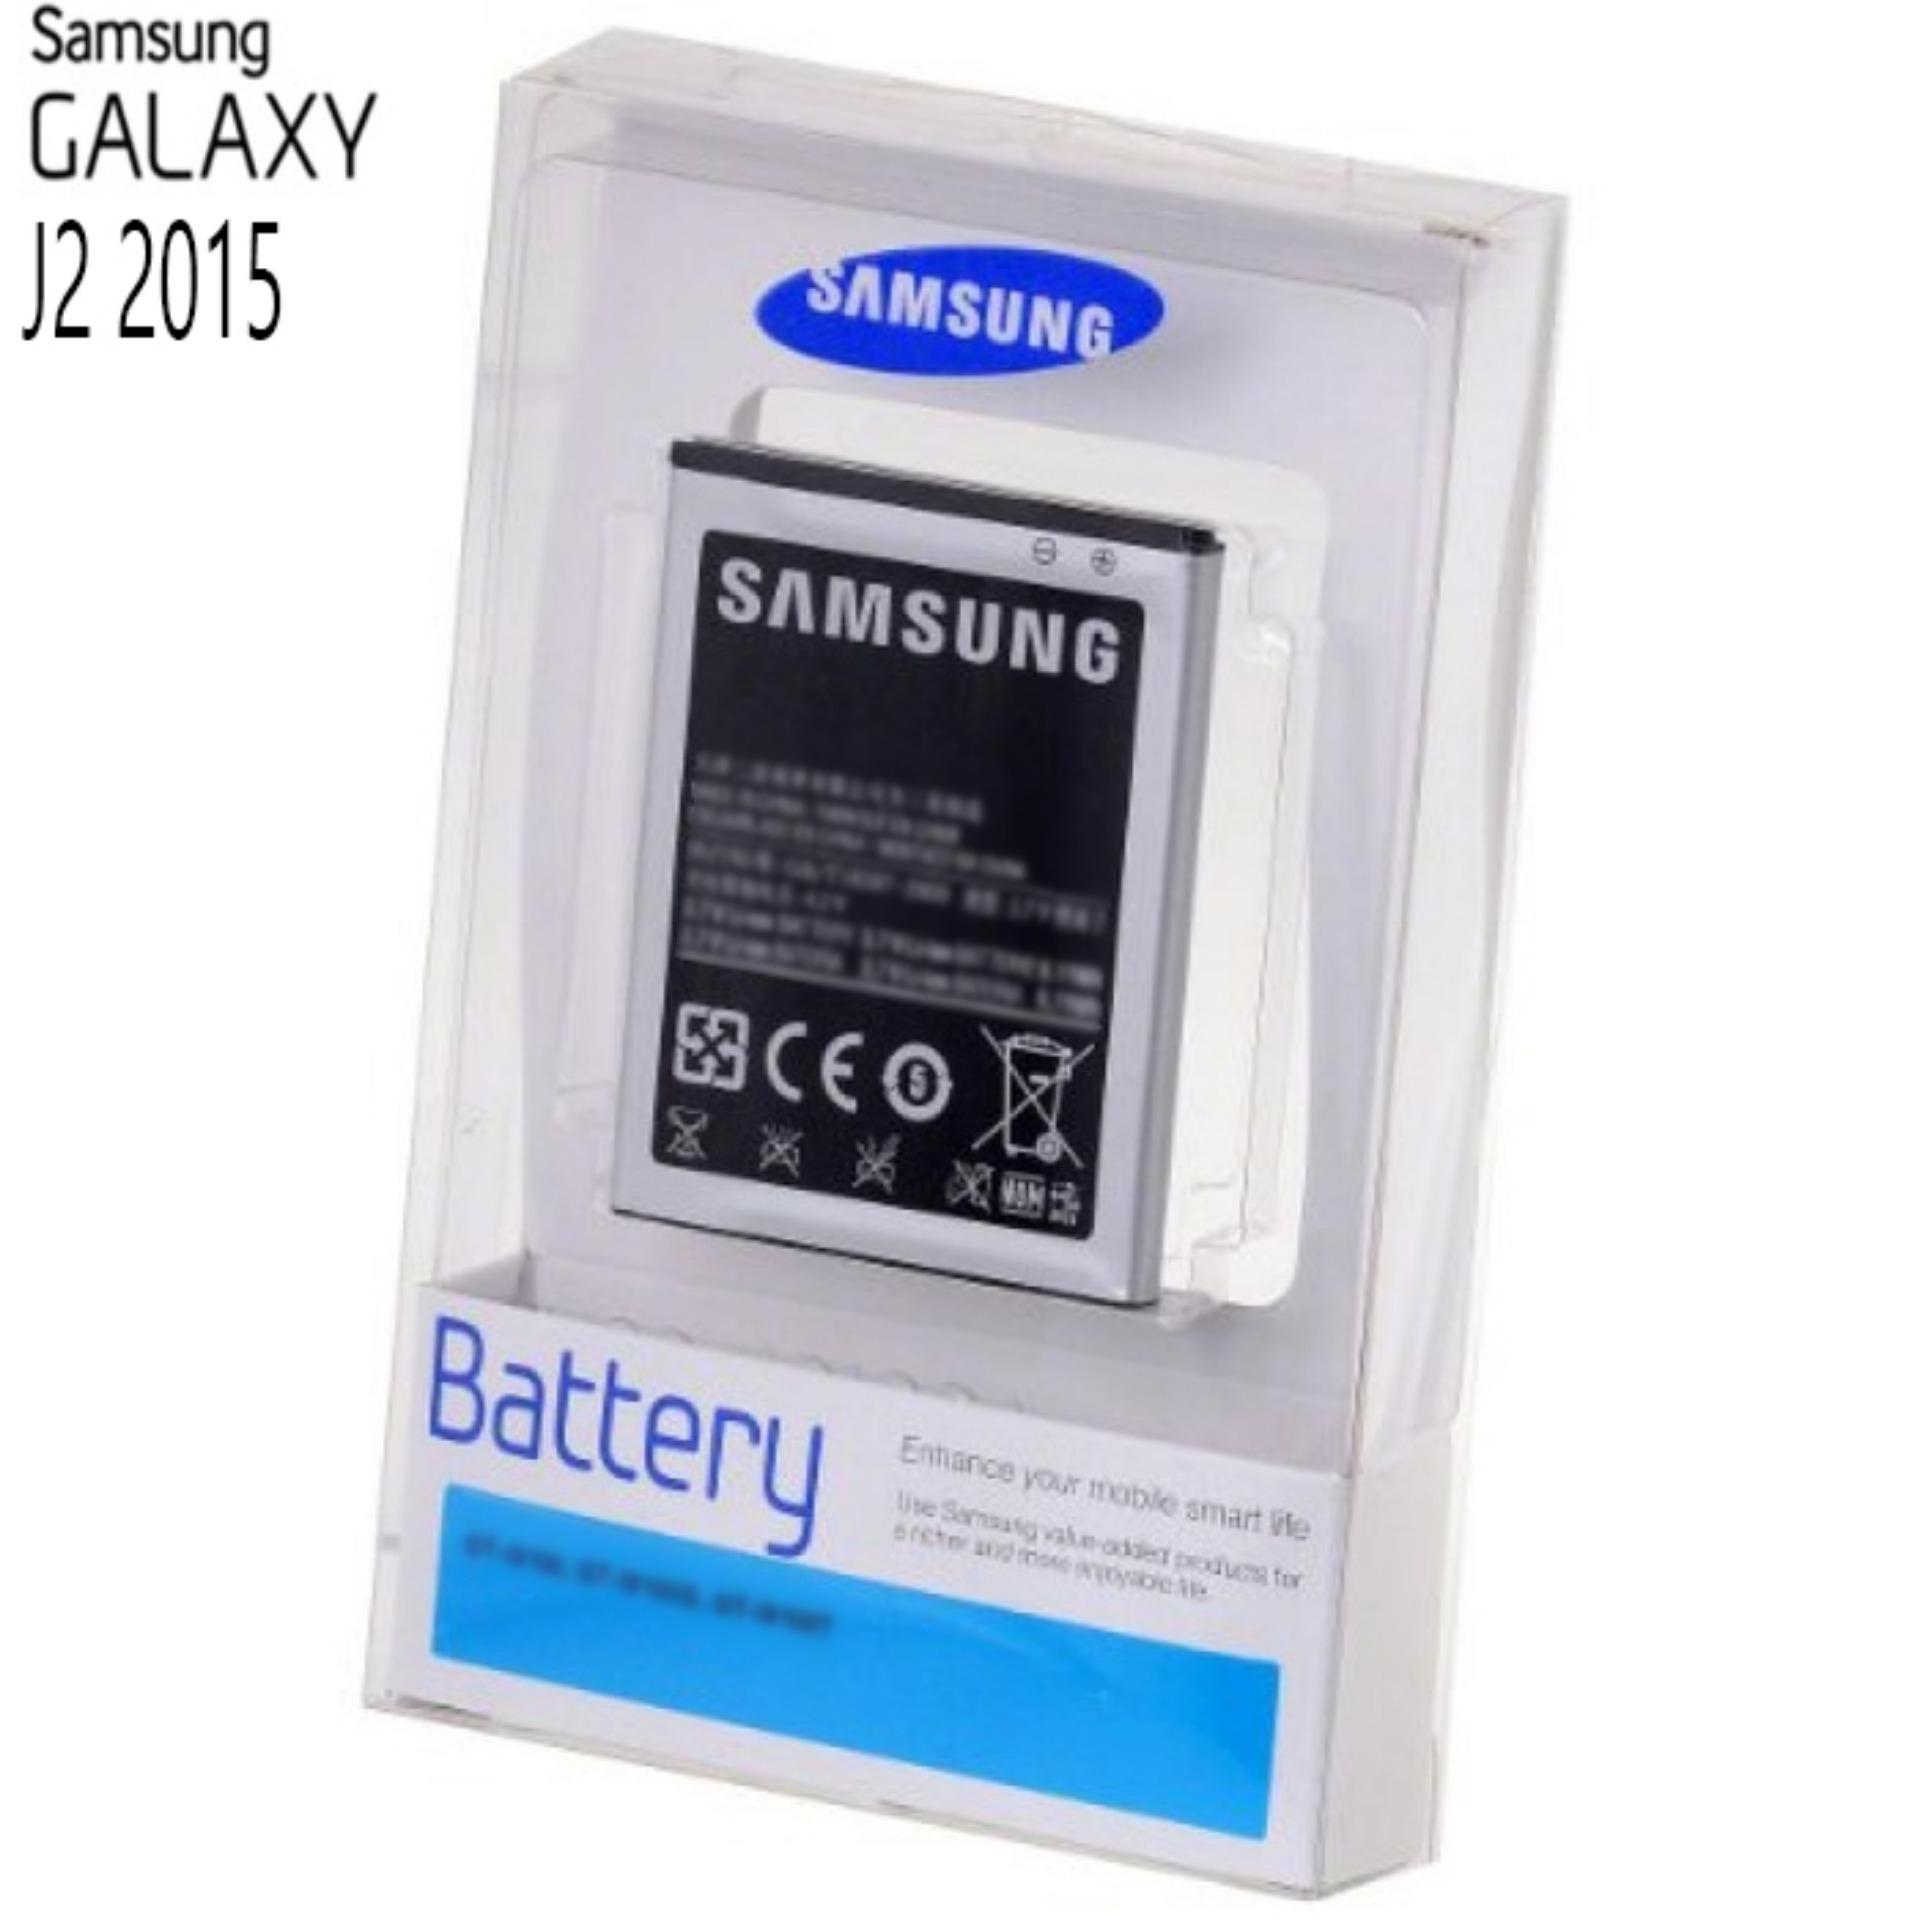 Baterai Batre Battery Samsung J2j200 Original 100 Sein Eb Bg360cbueb Vizz Double Power Galaxy J2 2015 J200 Batrai Ori Sm Hot Deals Terbaik